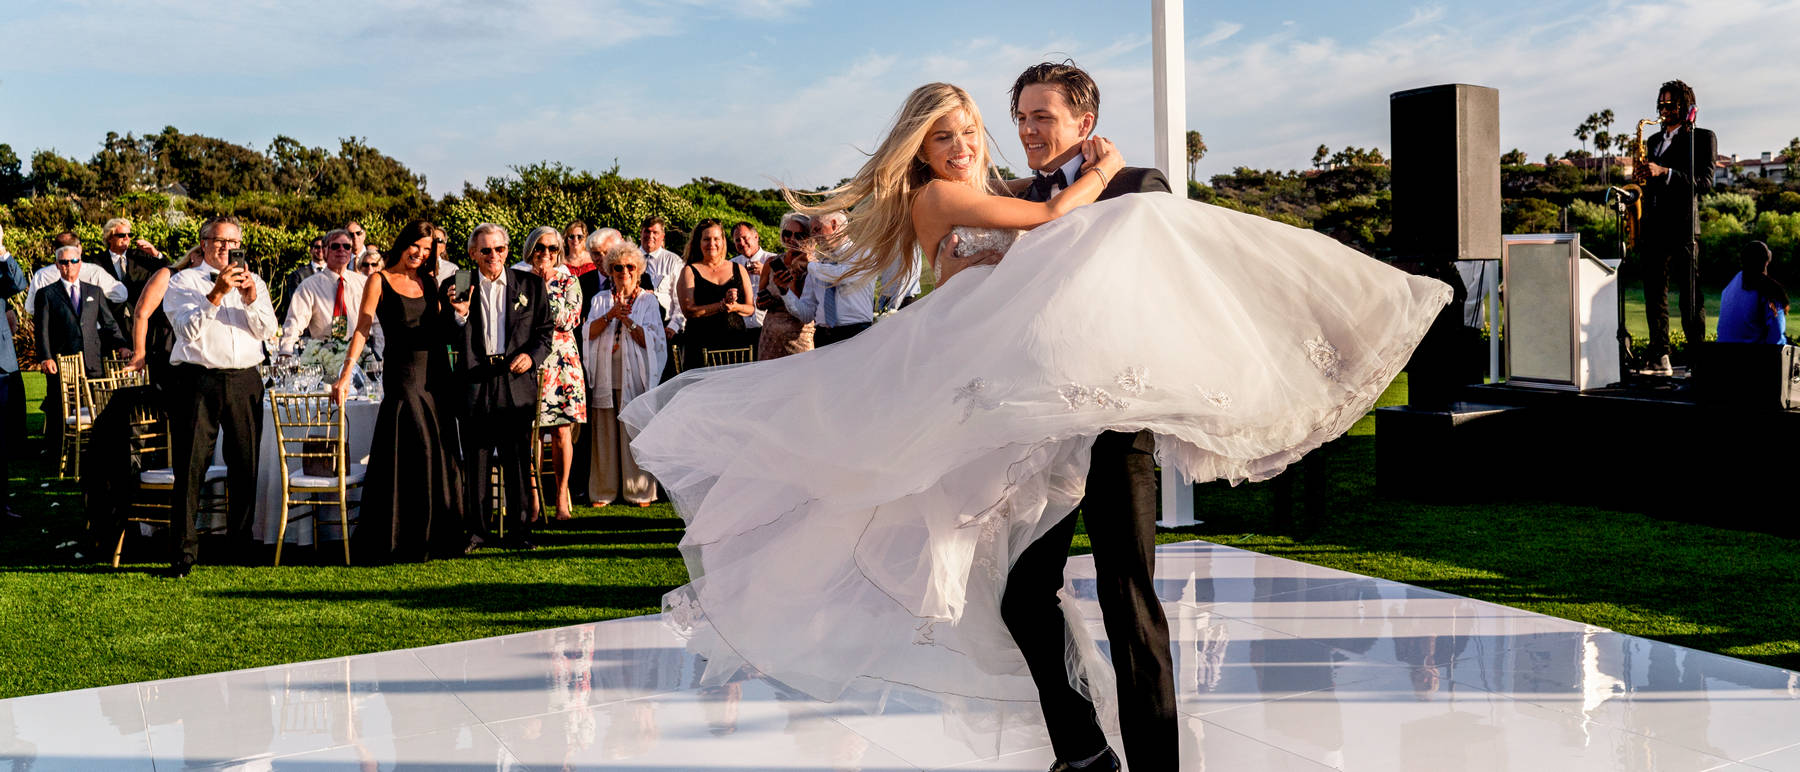 johnandjoseph-wedding-photographer-hz-slider-288